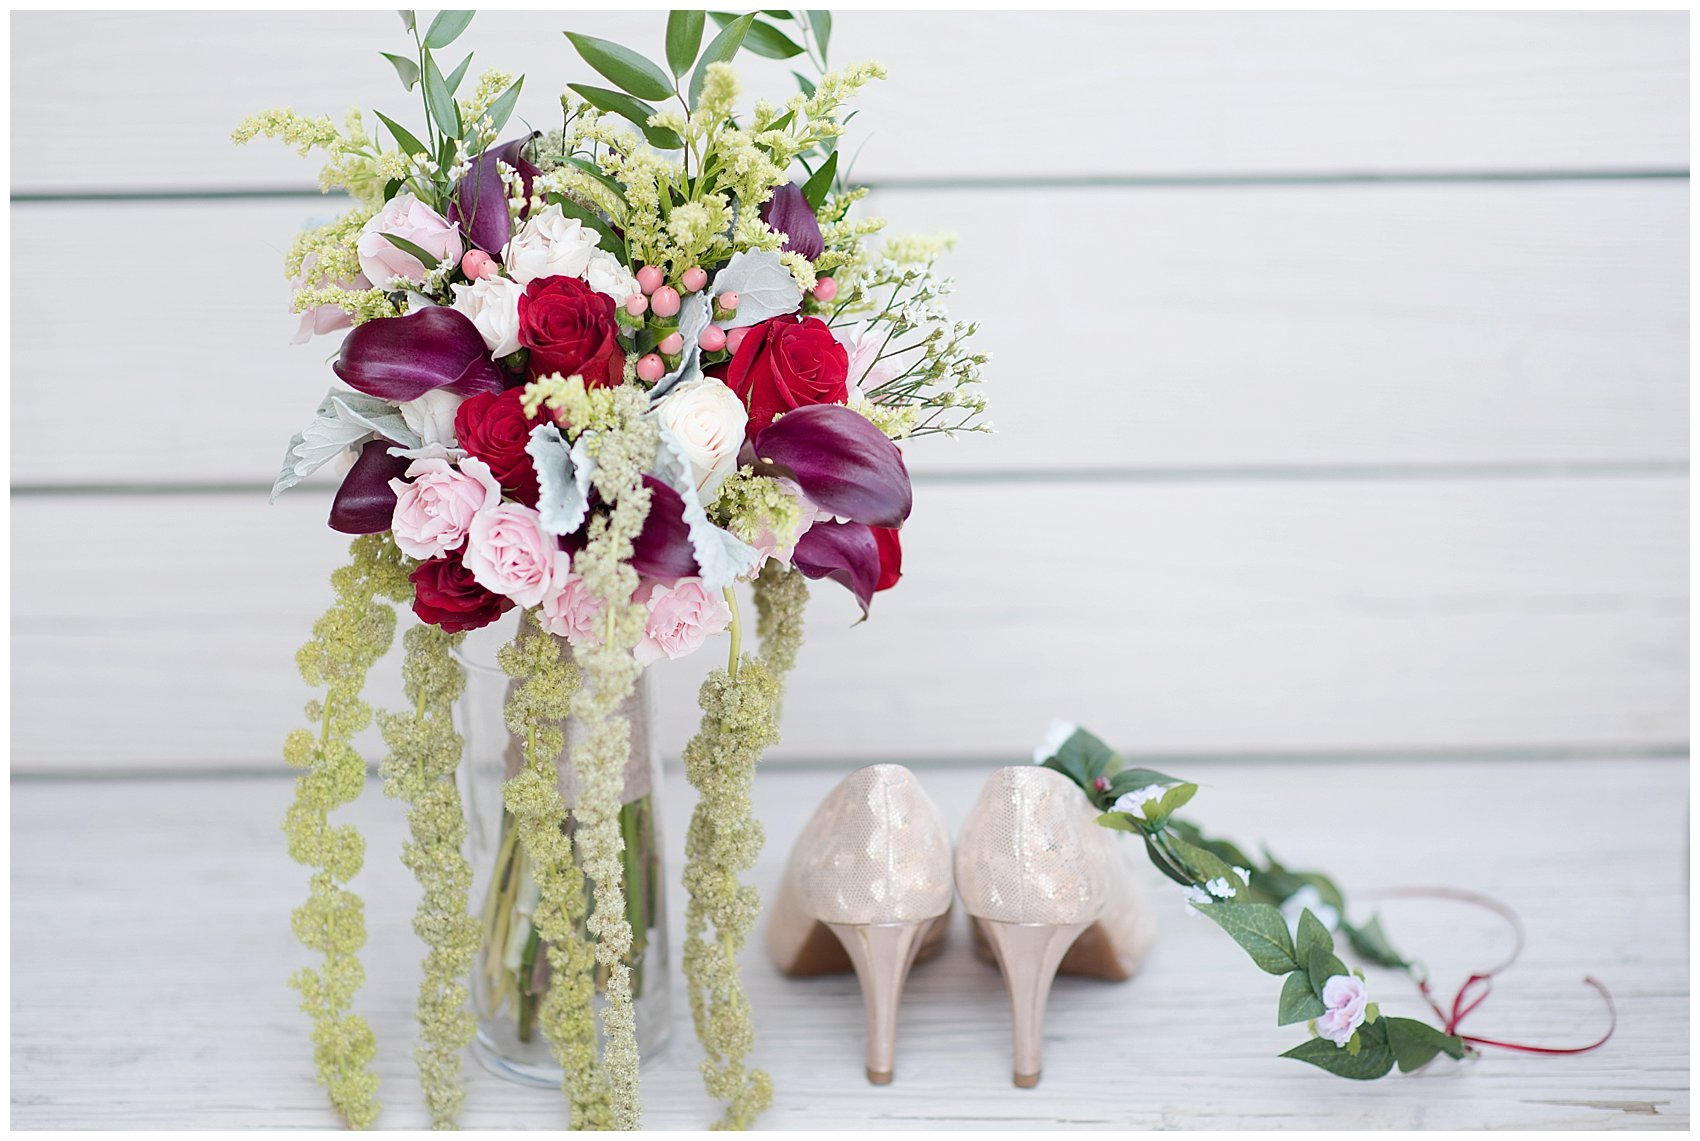 virginia-north-carolina-engagement-wedding-photographers-hampton-roads-virginia-engagement-photos-husband-and-wife-team-best-of-2016_3793